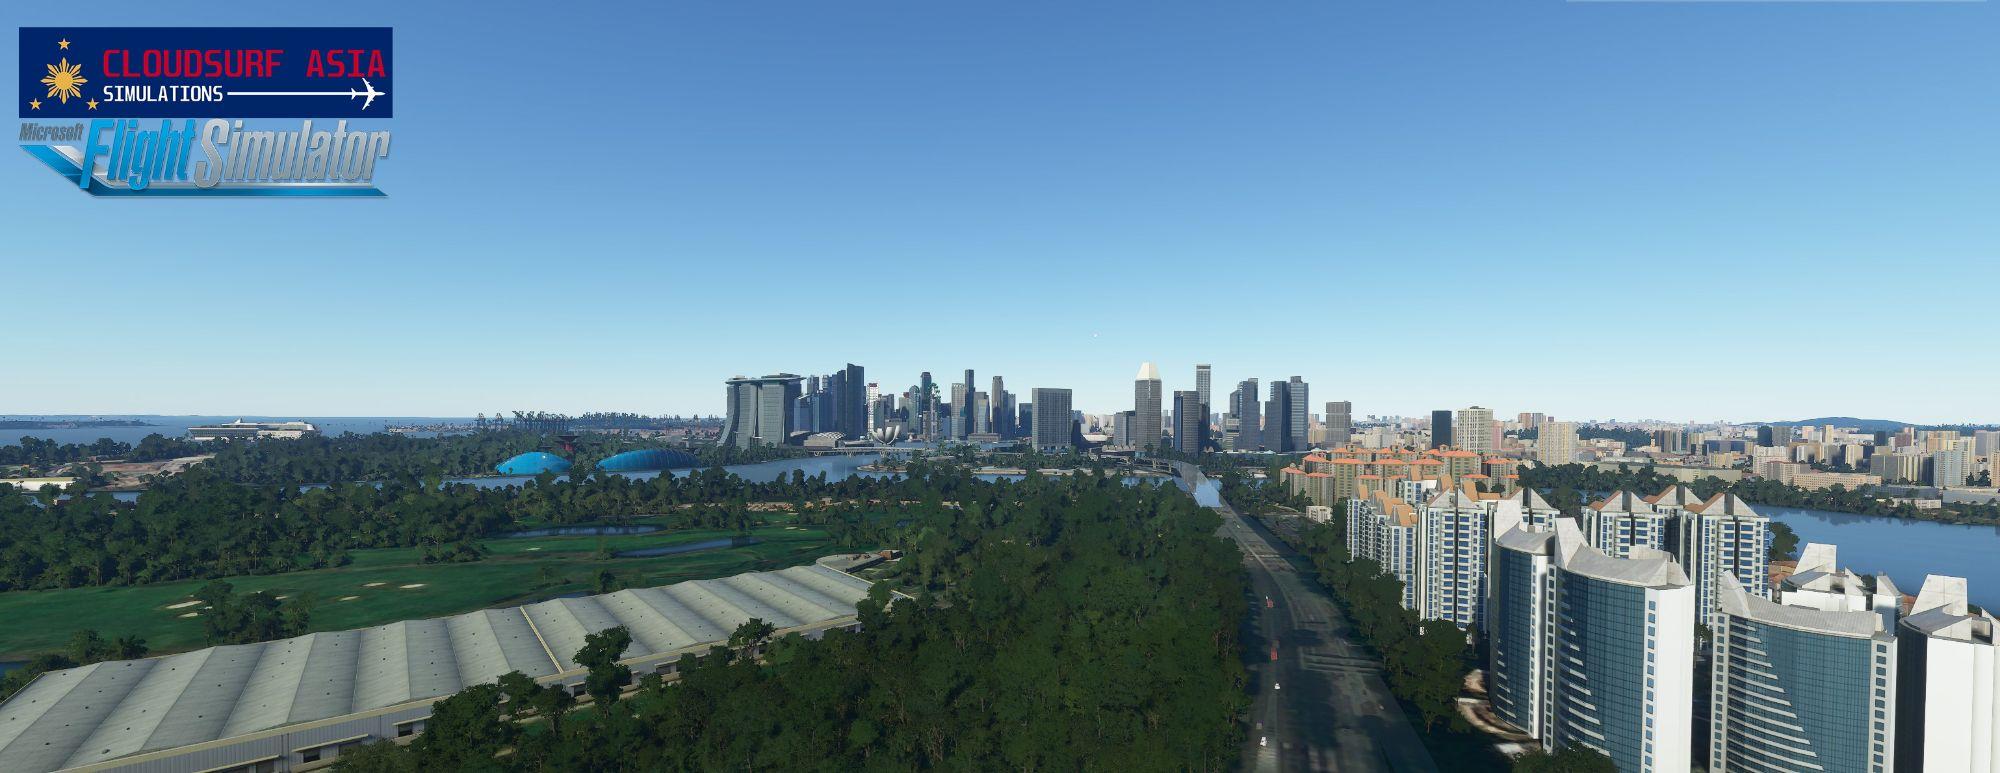 SINGAPOREDT3.jpg